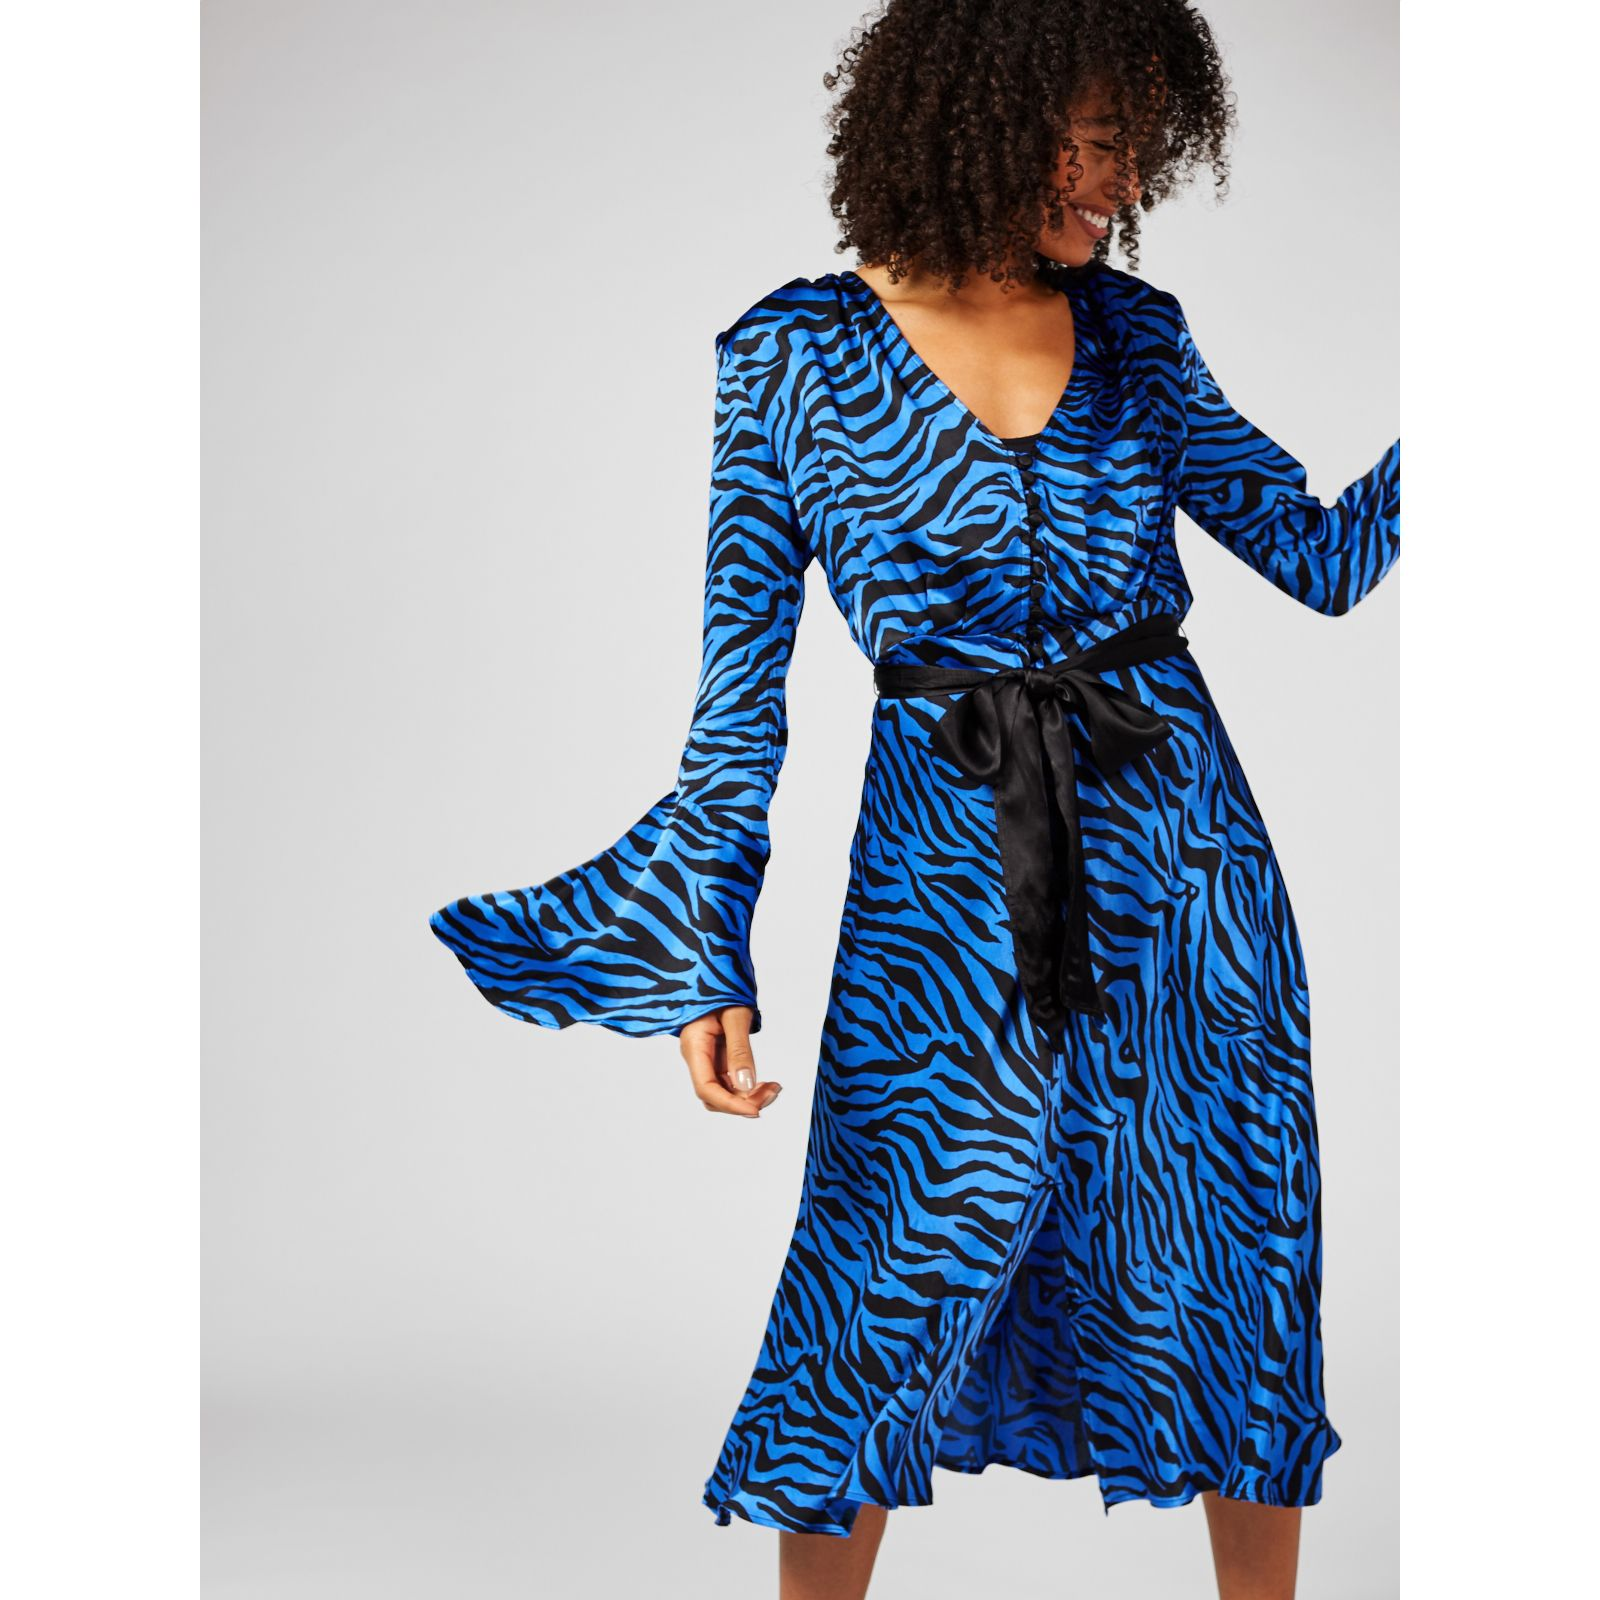 e0a97e4e0ec Ghost London Annabelle Dress - QVC UK